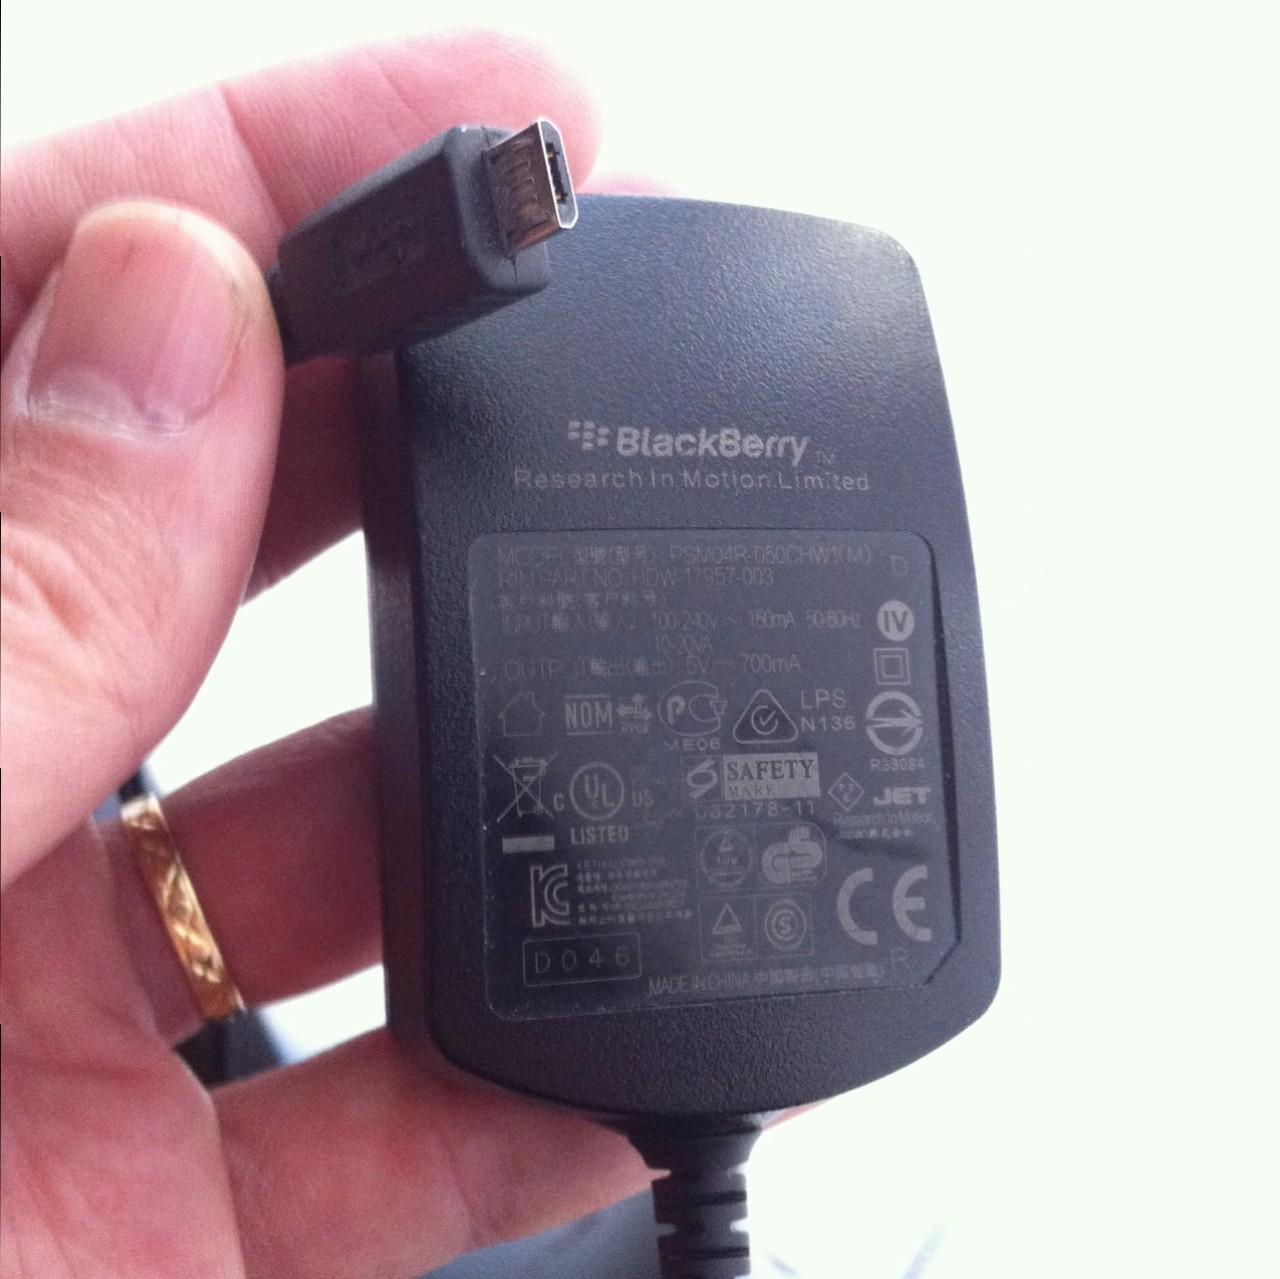 La Raspberry Pi 2 funciona con un cargador de 0,7A